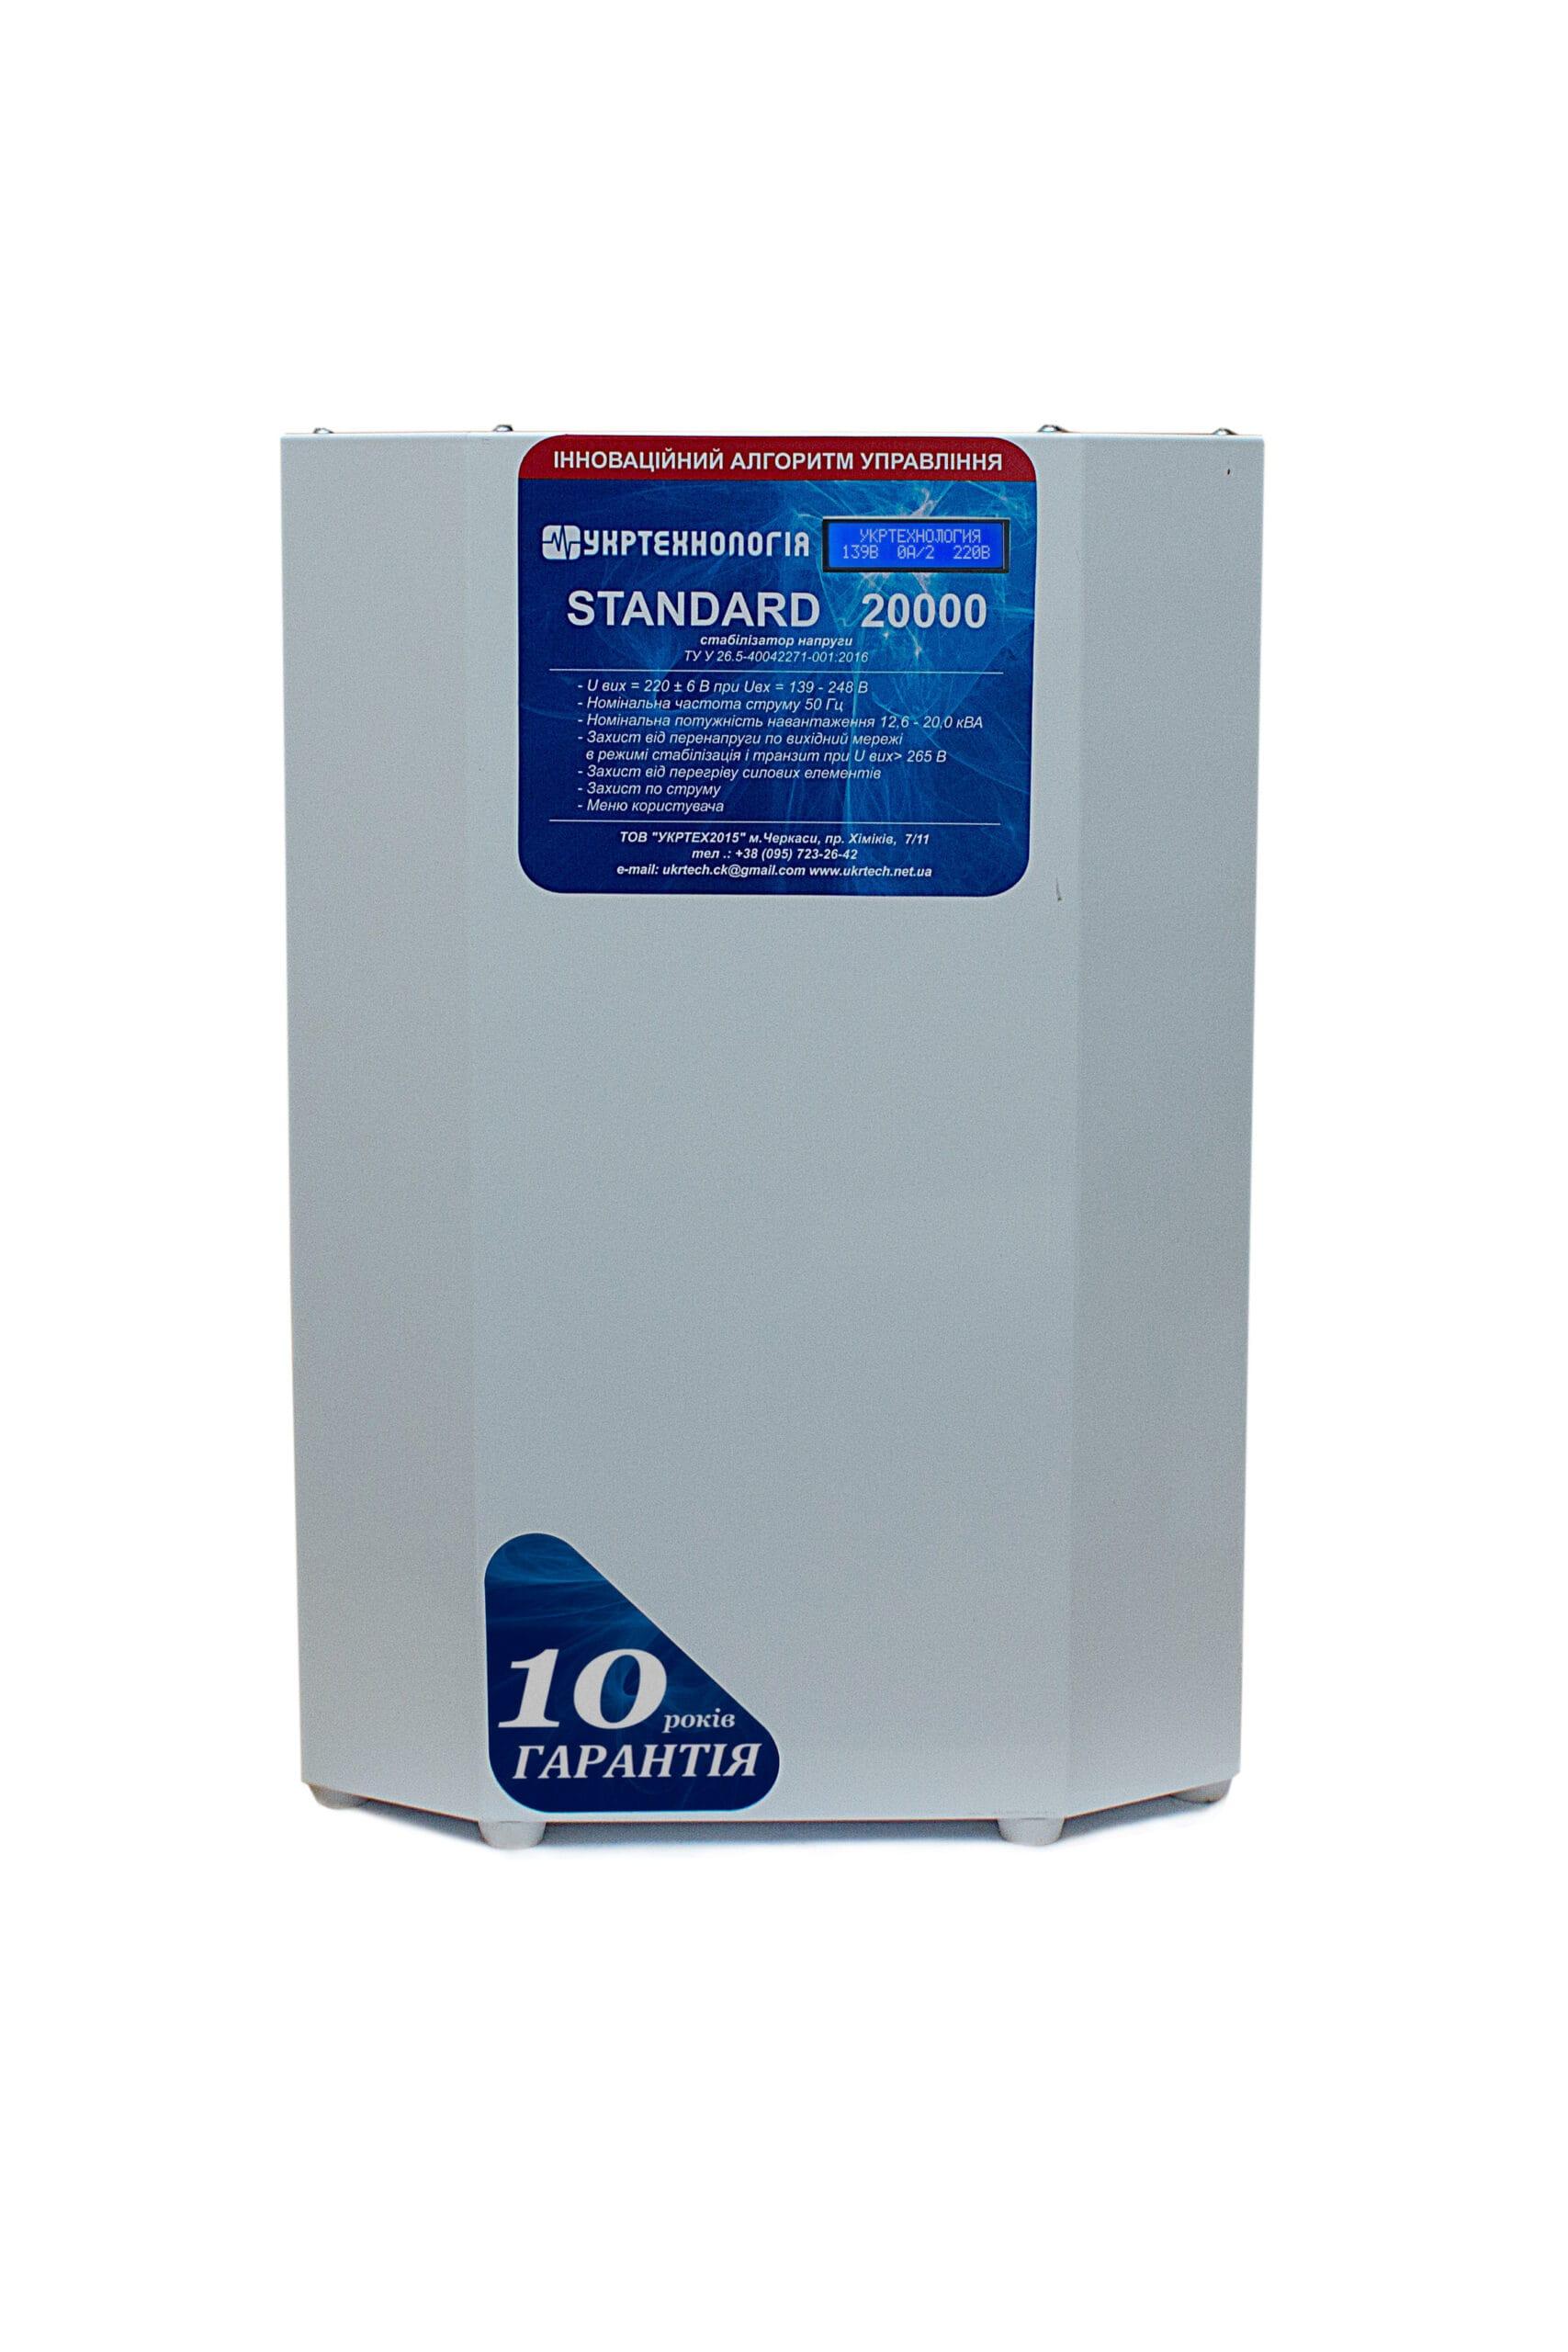 Стабилизаторы напряжения - Стабилизатор напряжения 20 кВт STANDARD  000001401 - Фото 3